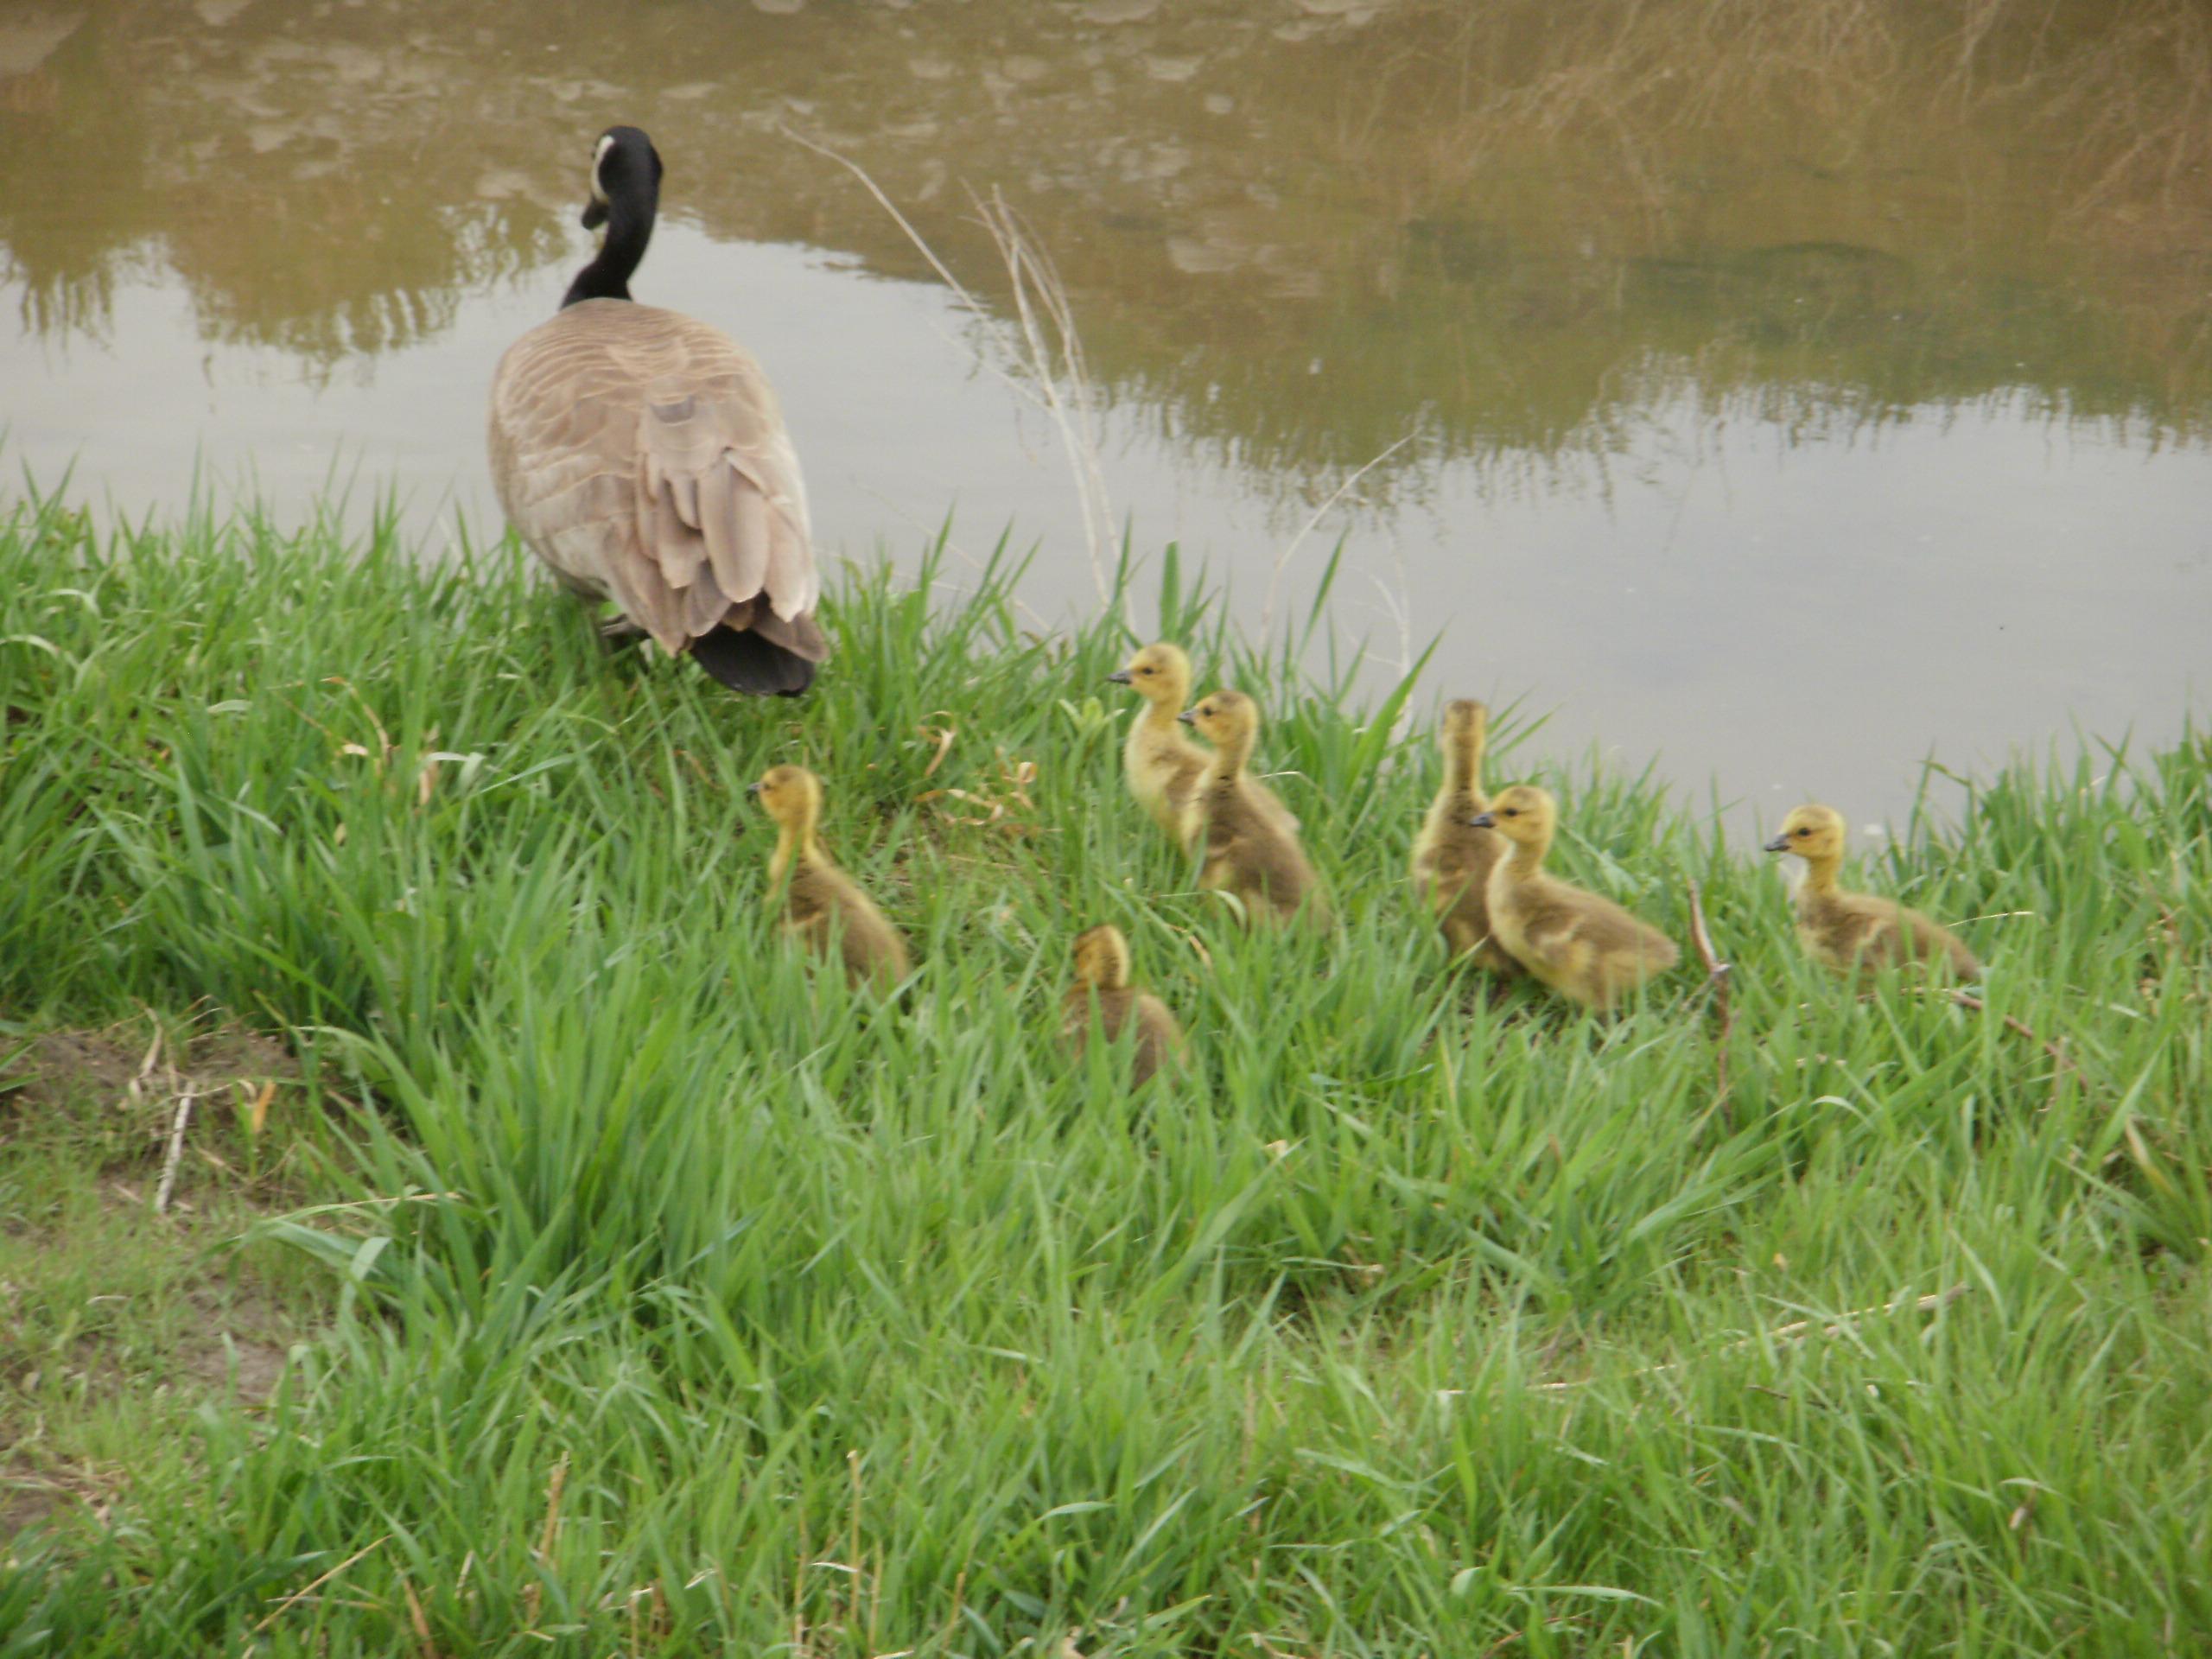 baby geese from ospreynest 002 (2).jpg